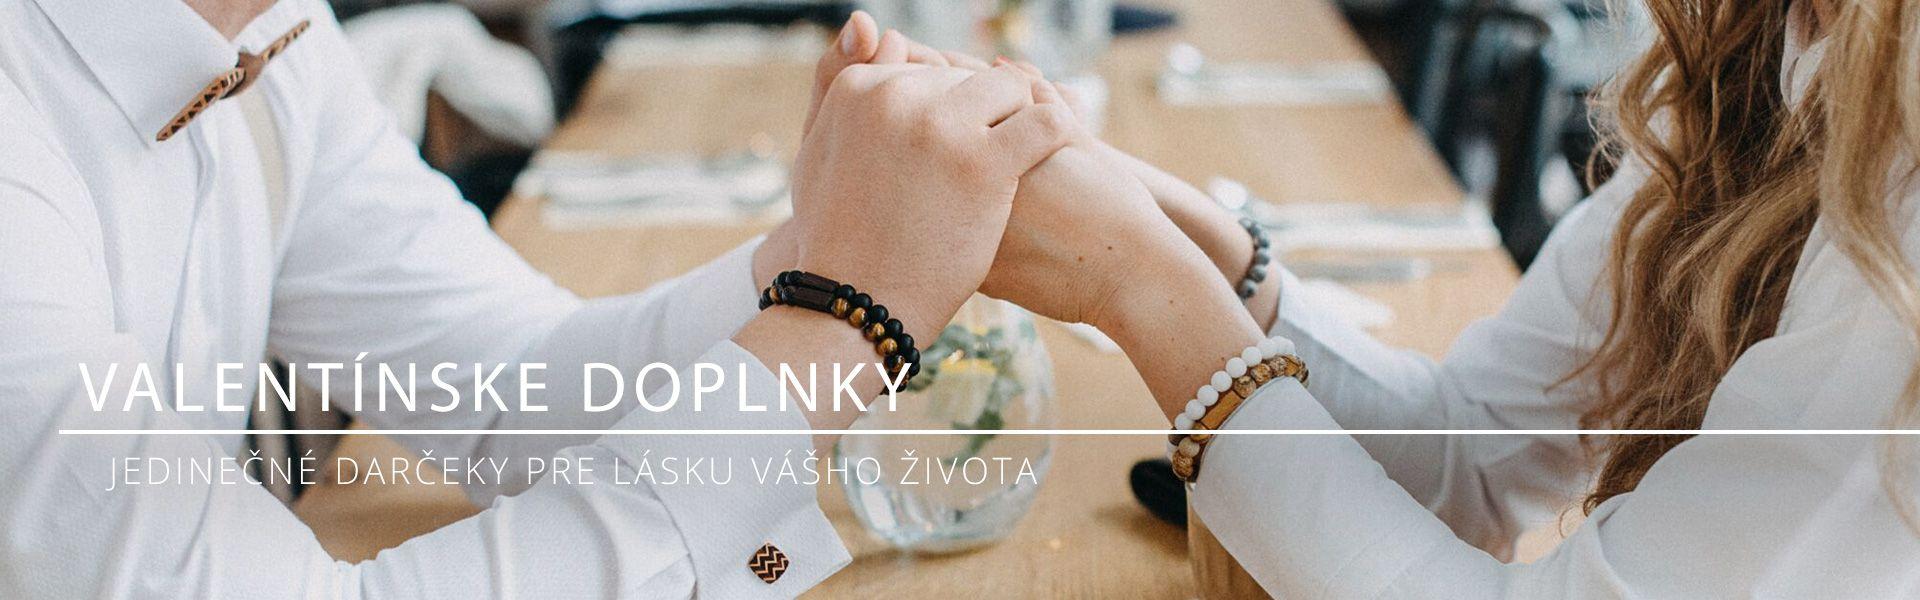 Valentyn_banner_SK